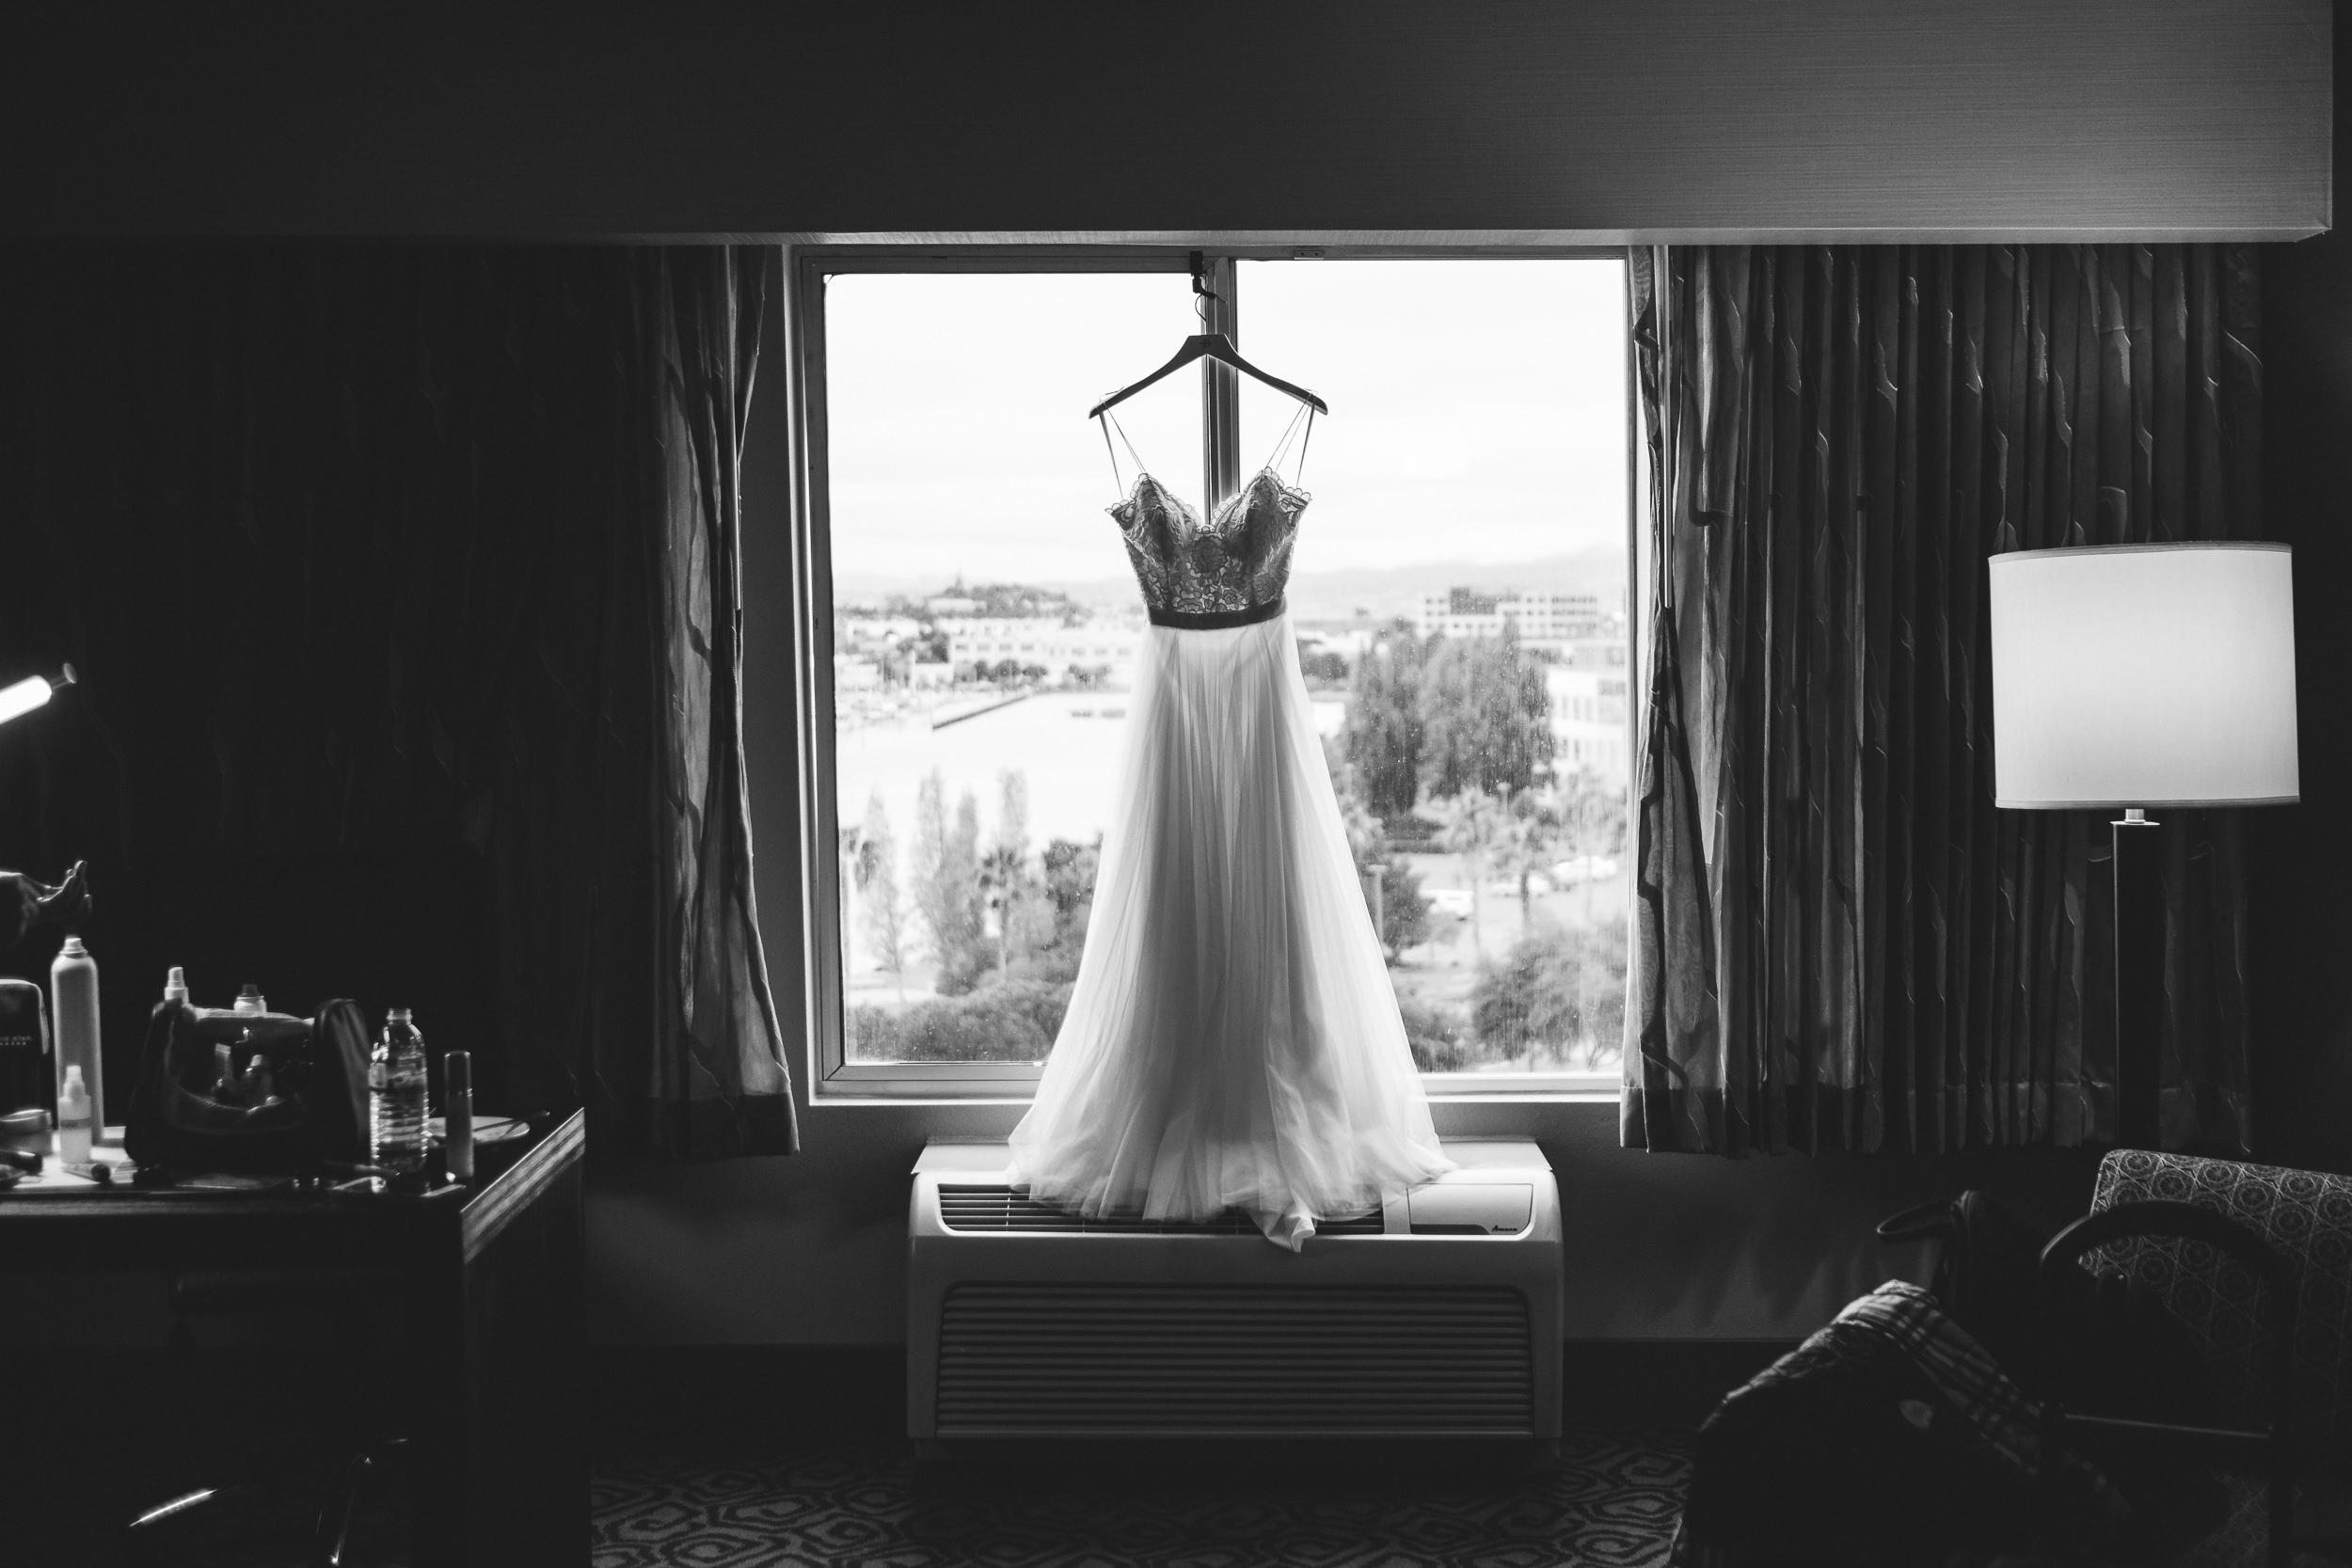 San-Francisco-City-Hall-Wedding-Photography-004.jpg